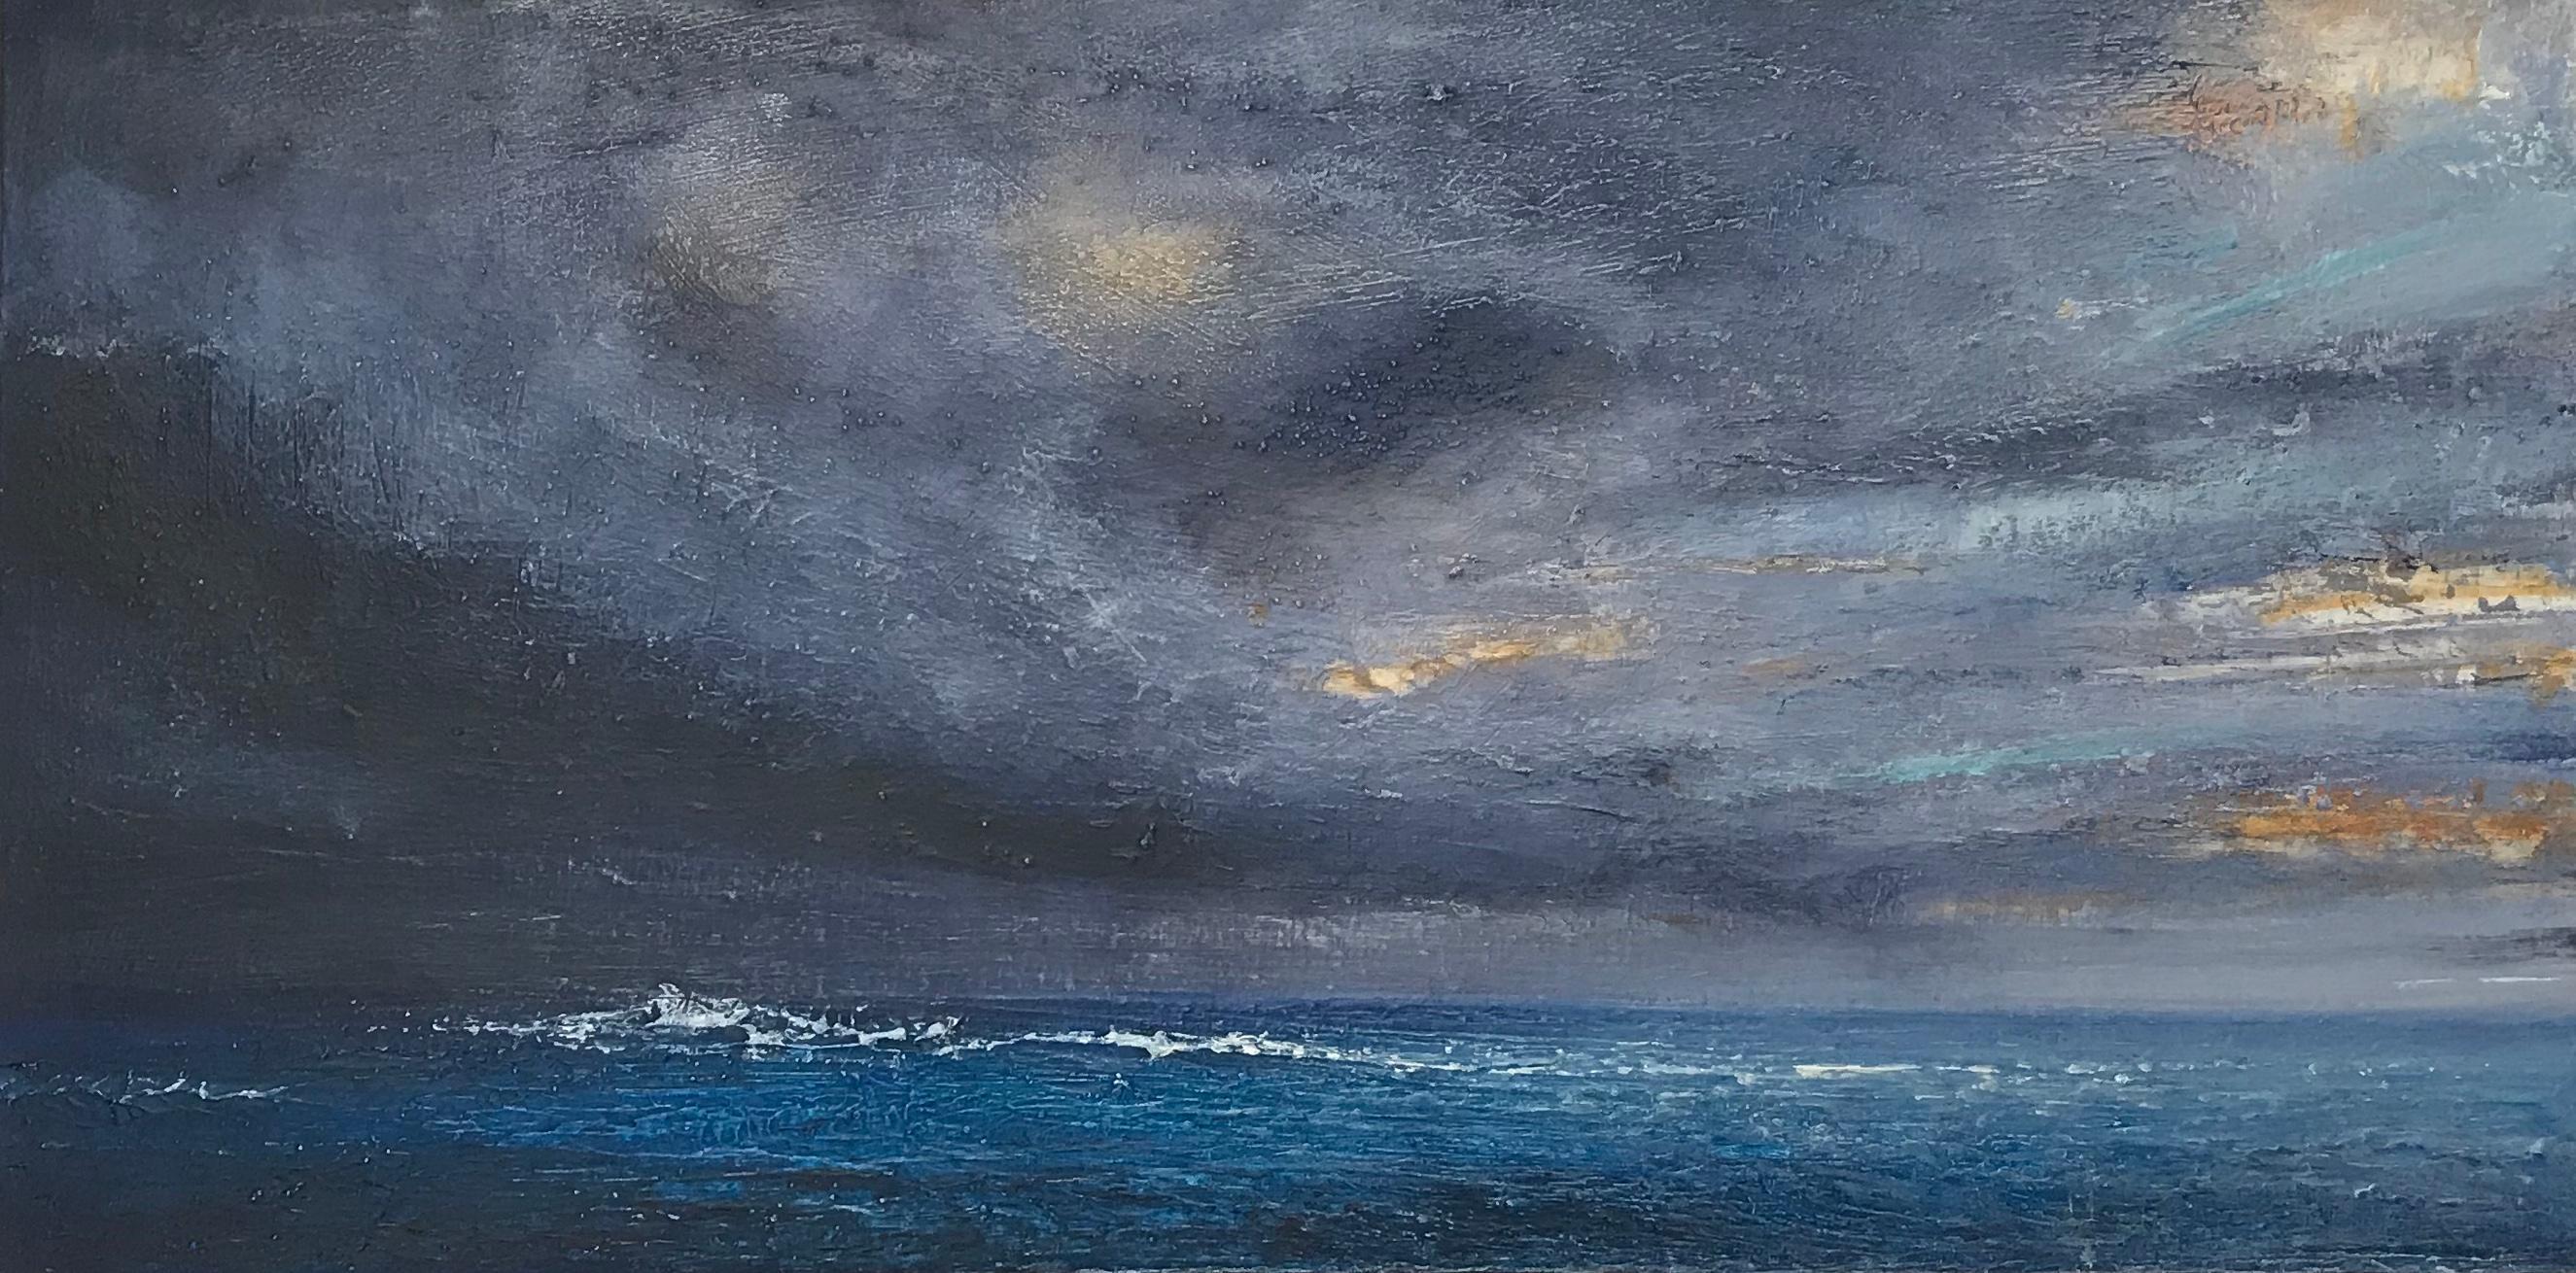 Alison Groom, Tropical Storm, Original Painting, Contemporary Art, Art Online